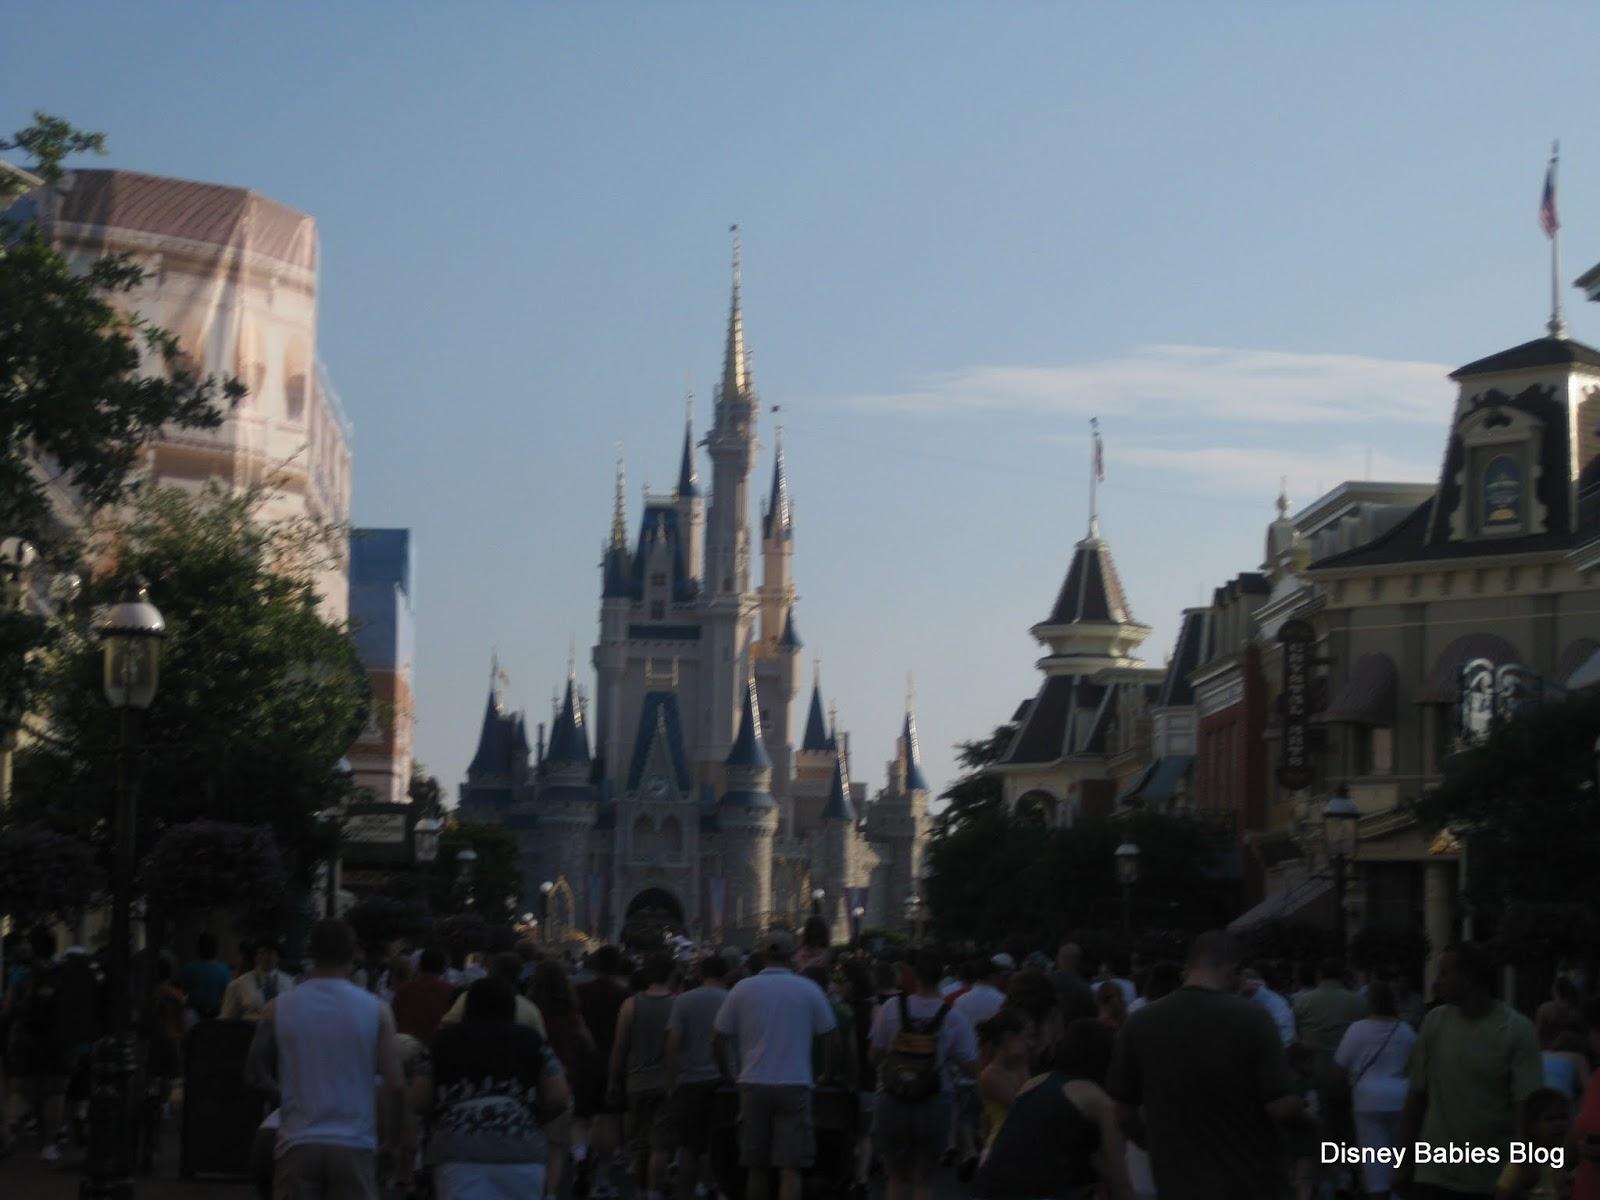 Disney Babies Blog September 2012